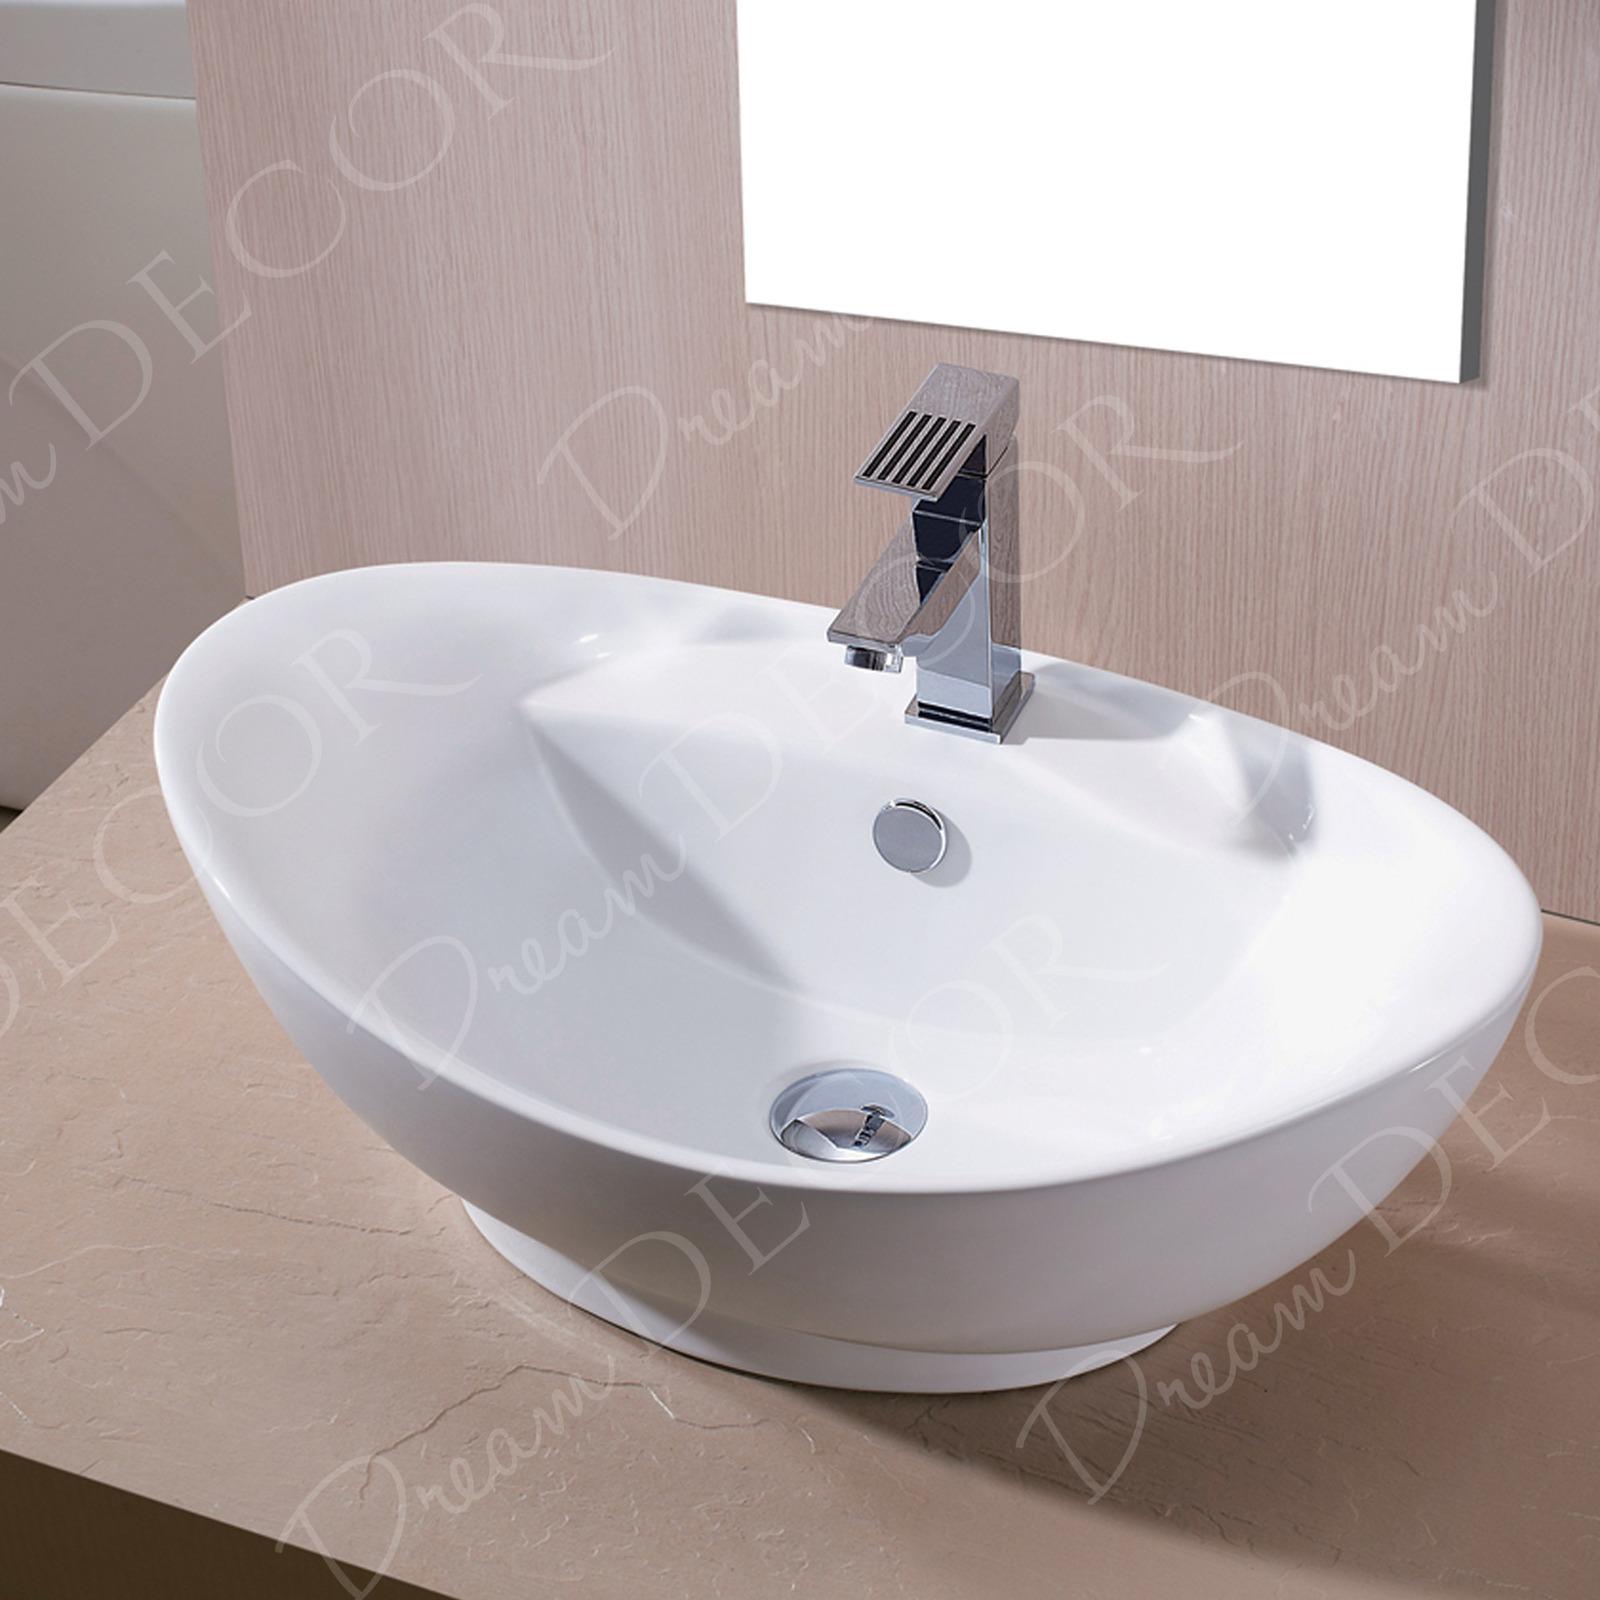 Bathroom Egg Porcelain Ceramic Vessel Vanity Sink & Brushed Nickel ...